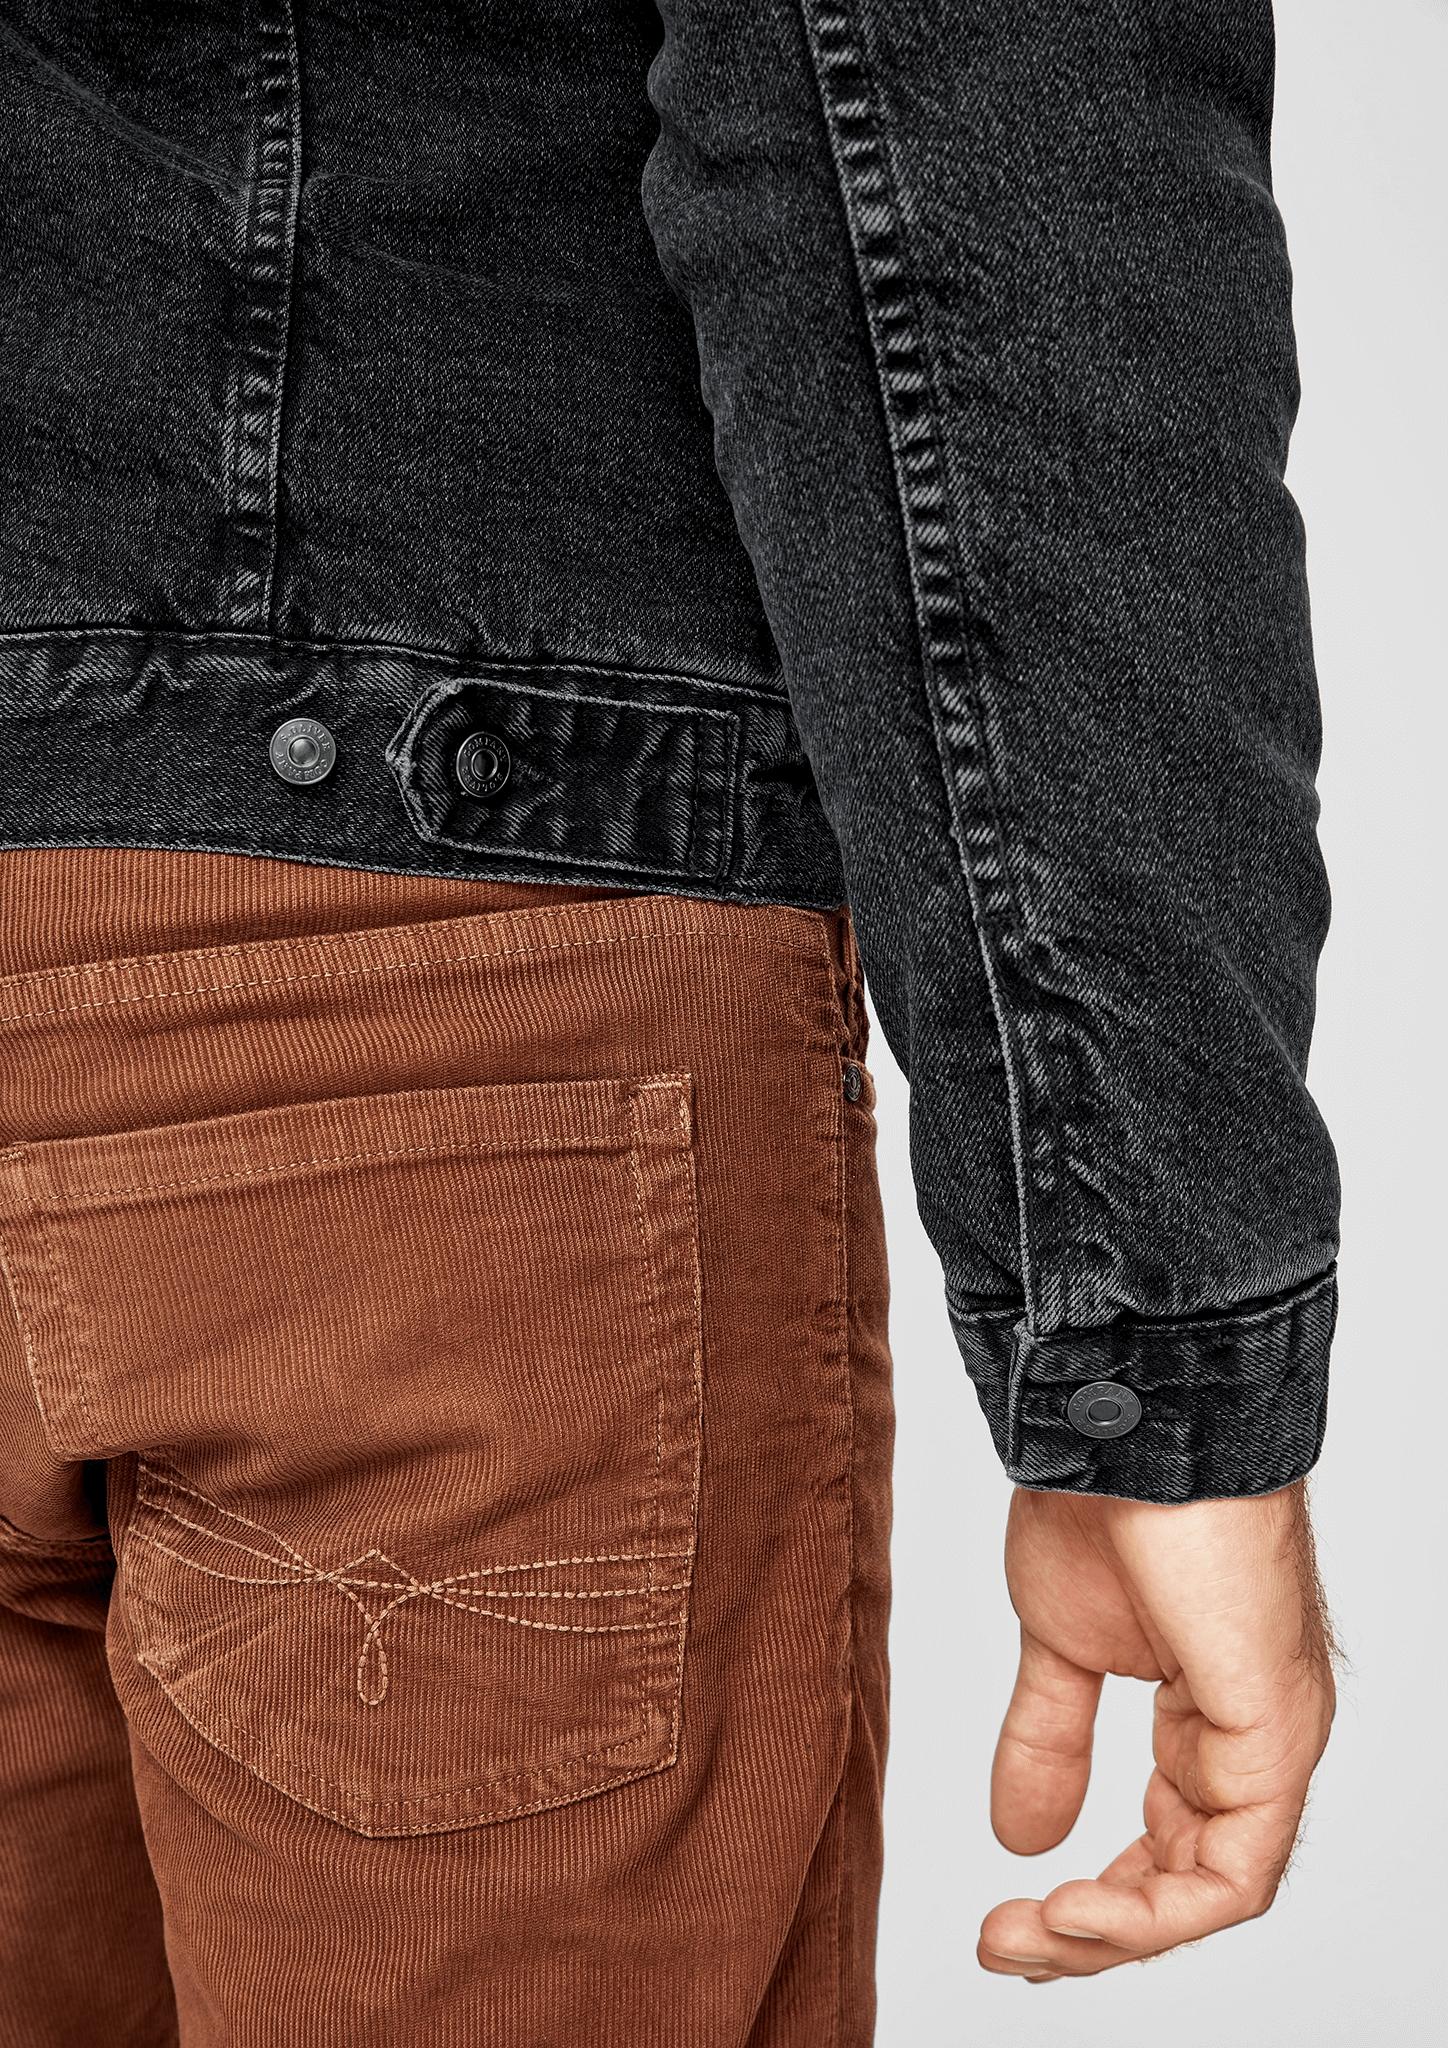 S Mit Futter Teddy Details oliver Jeansjacke Zu Neu Casual Men rCxdBeo